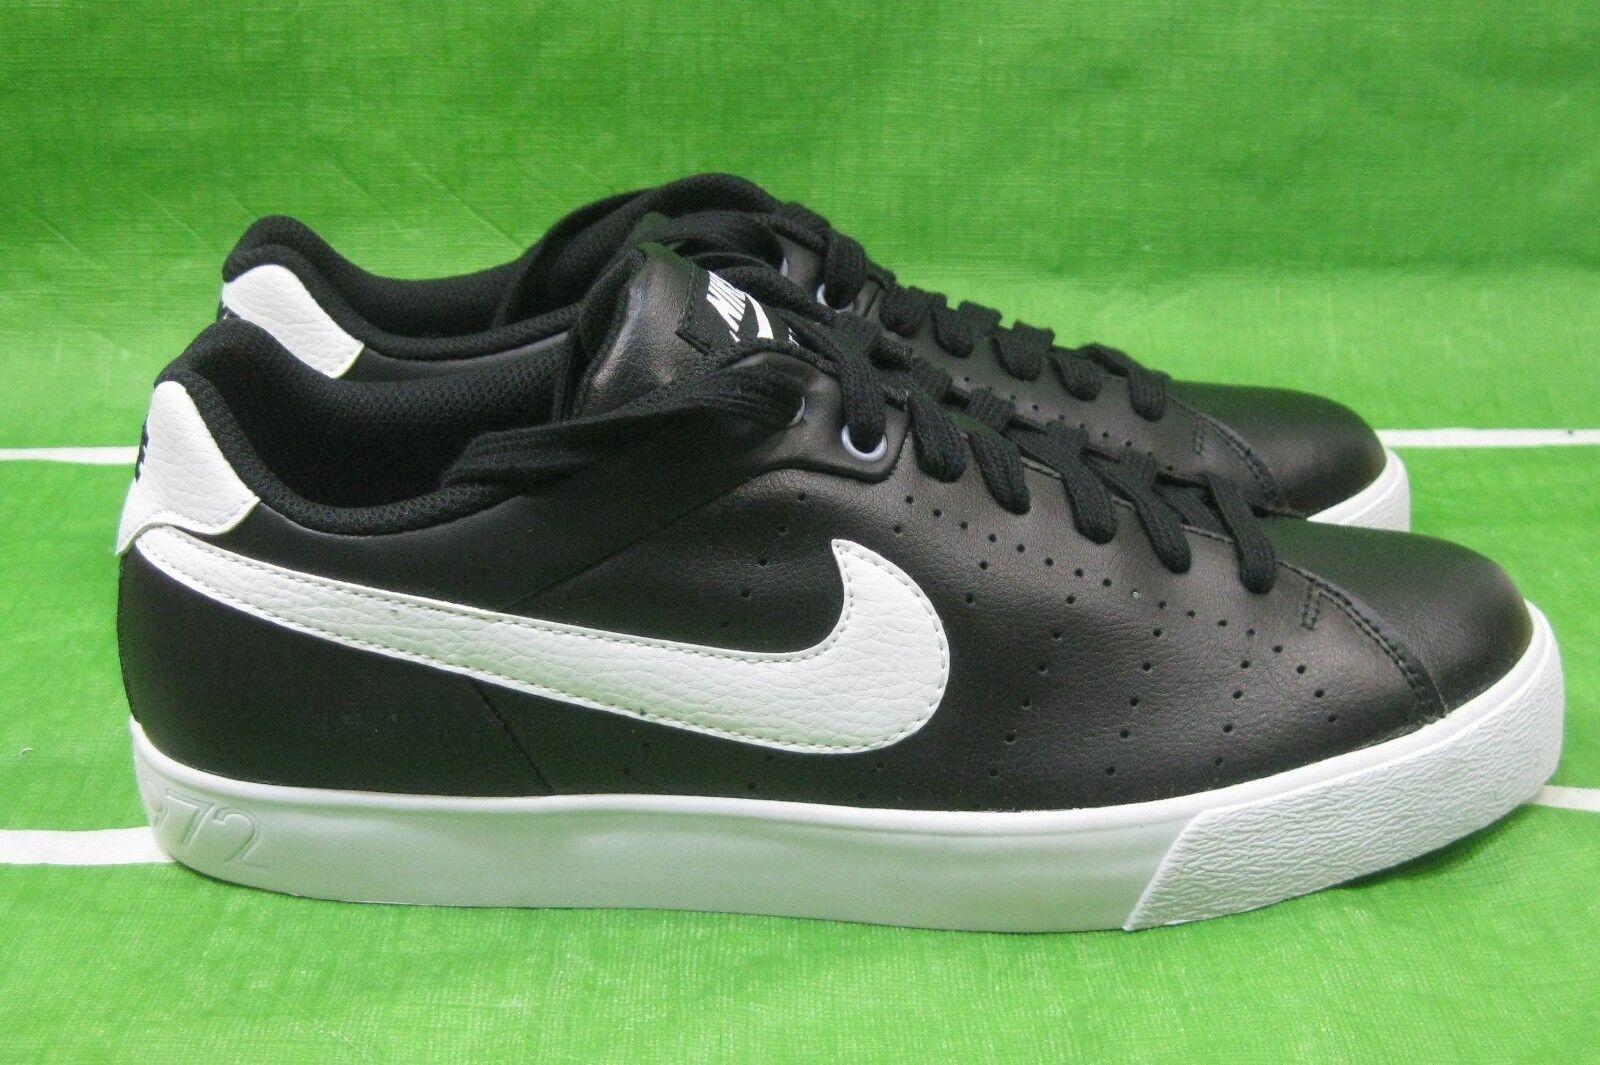 New black Nike Court Tour 458673-010 black New leather white  Size 9.5 75507d